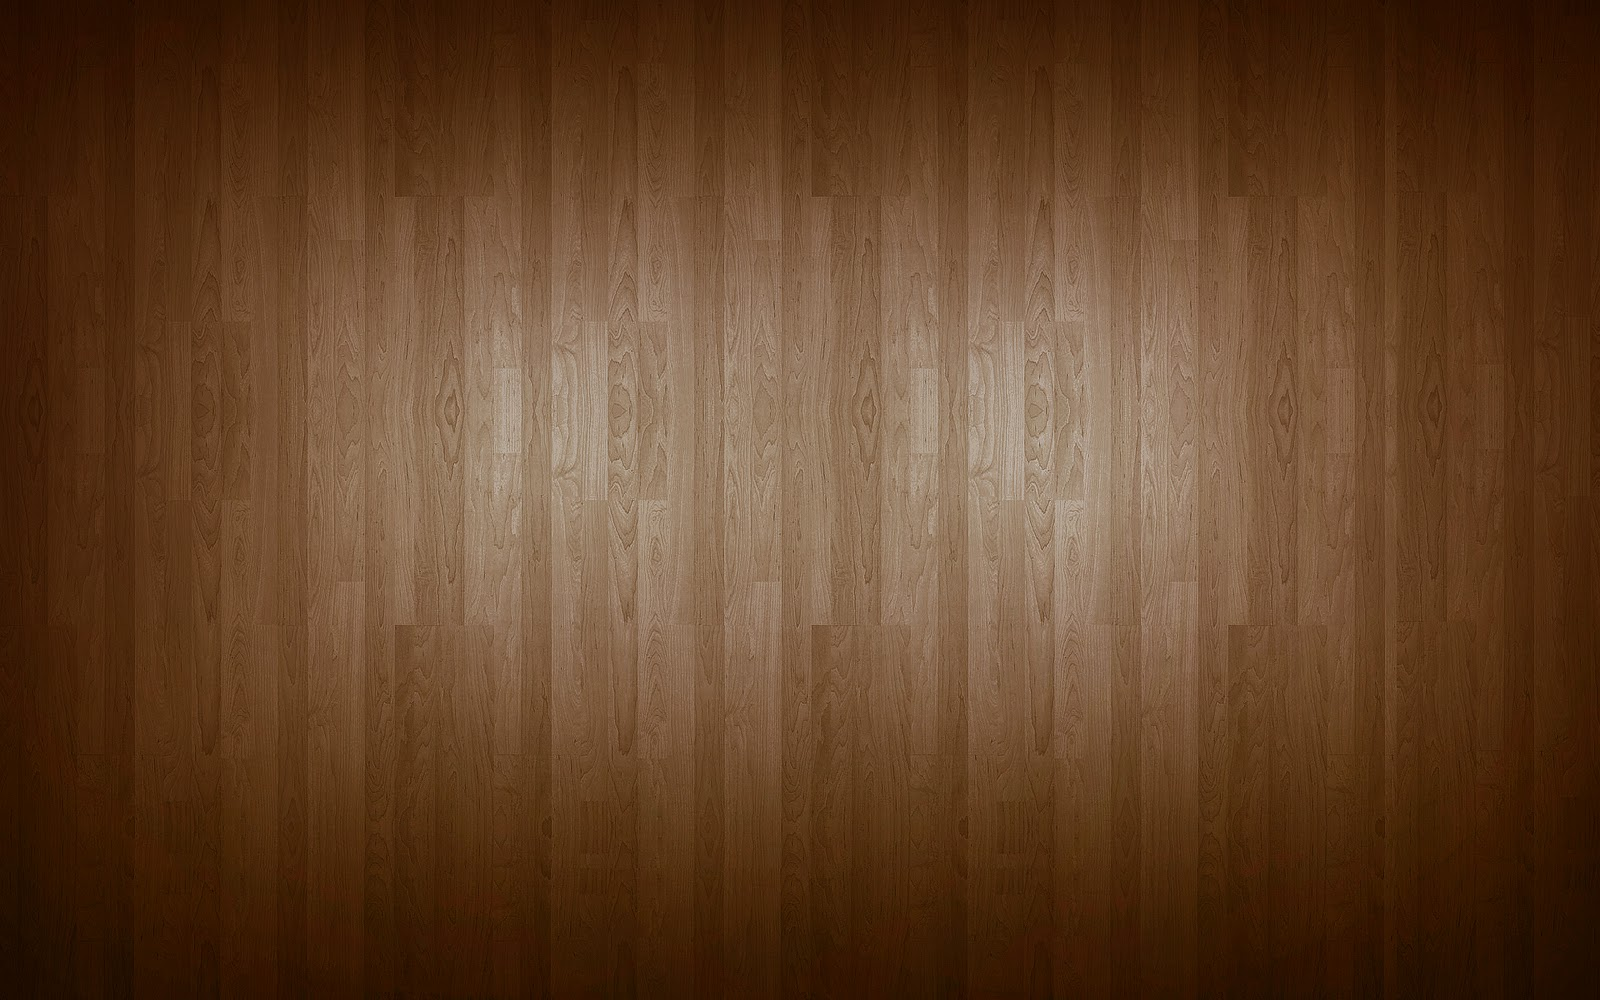 laminaat wallpaper houten wallpaper met apple logo houten wallpaper 1600x1000